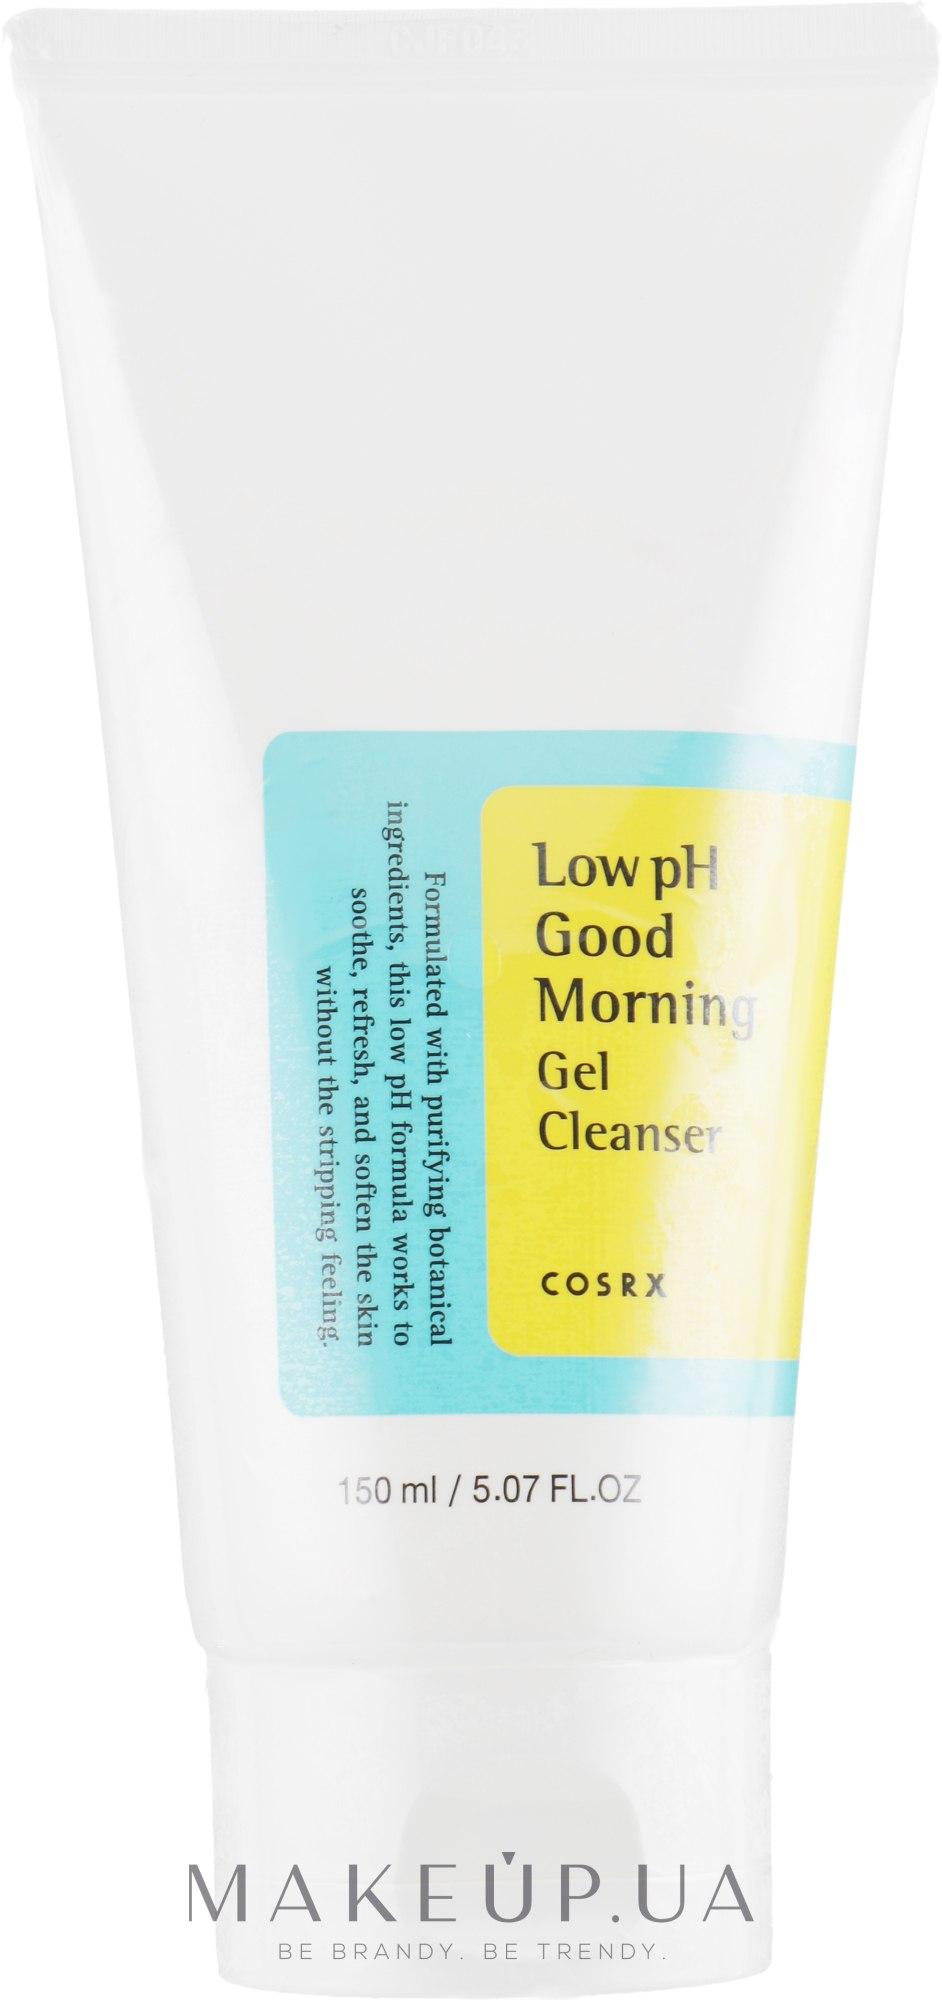 Гель-пенка с ВНА-кислотами - Cosrx Low Ph Good Morning Gel Cleanser — фото 150ml